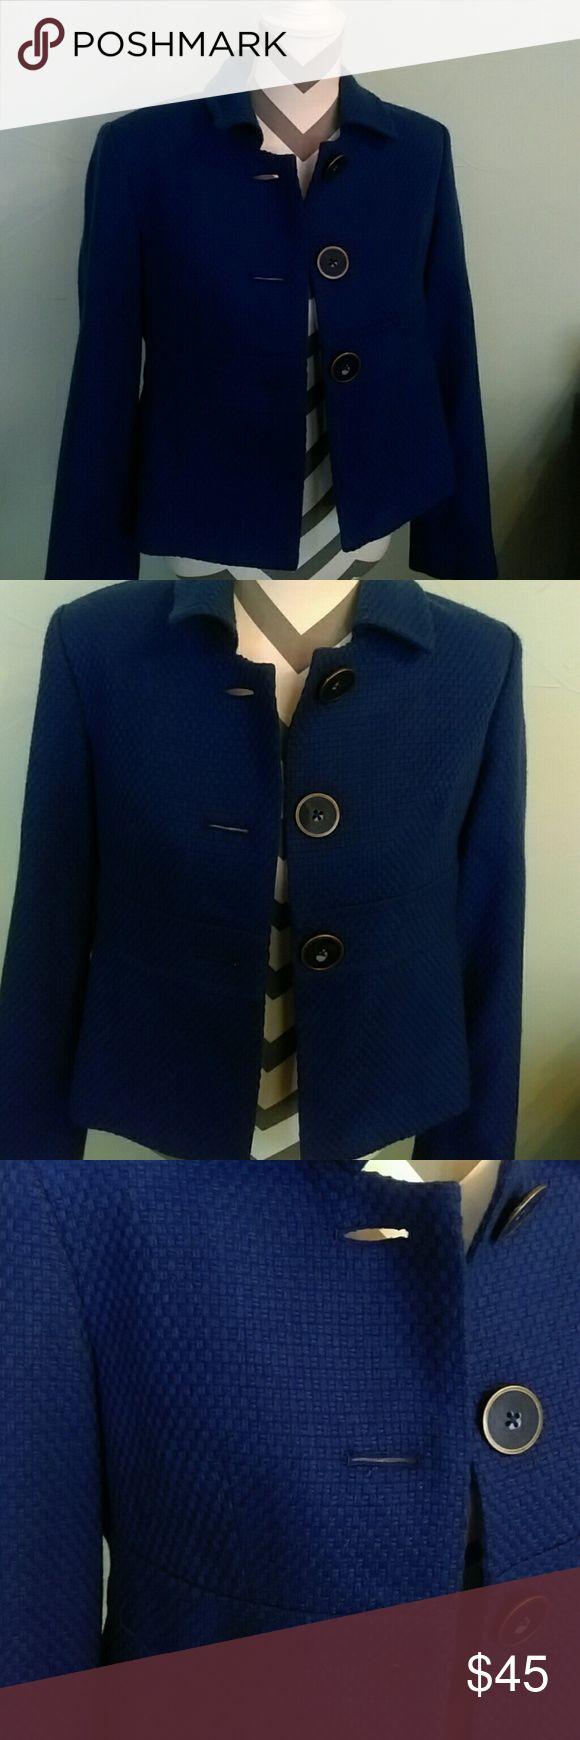 SALE! Coletane blue tweedlike blazer SALE! Coletane blue blazer  Lined blazer  Perfect condition!  Perfect condition! Coletane Jackets & Coats Blazers